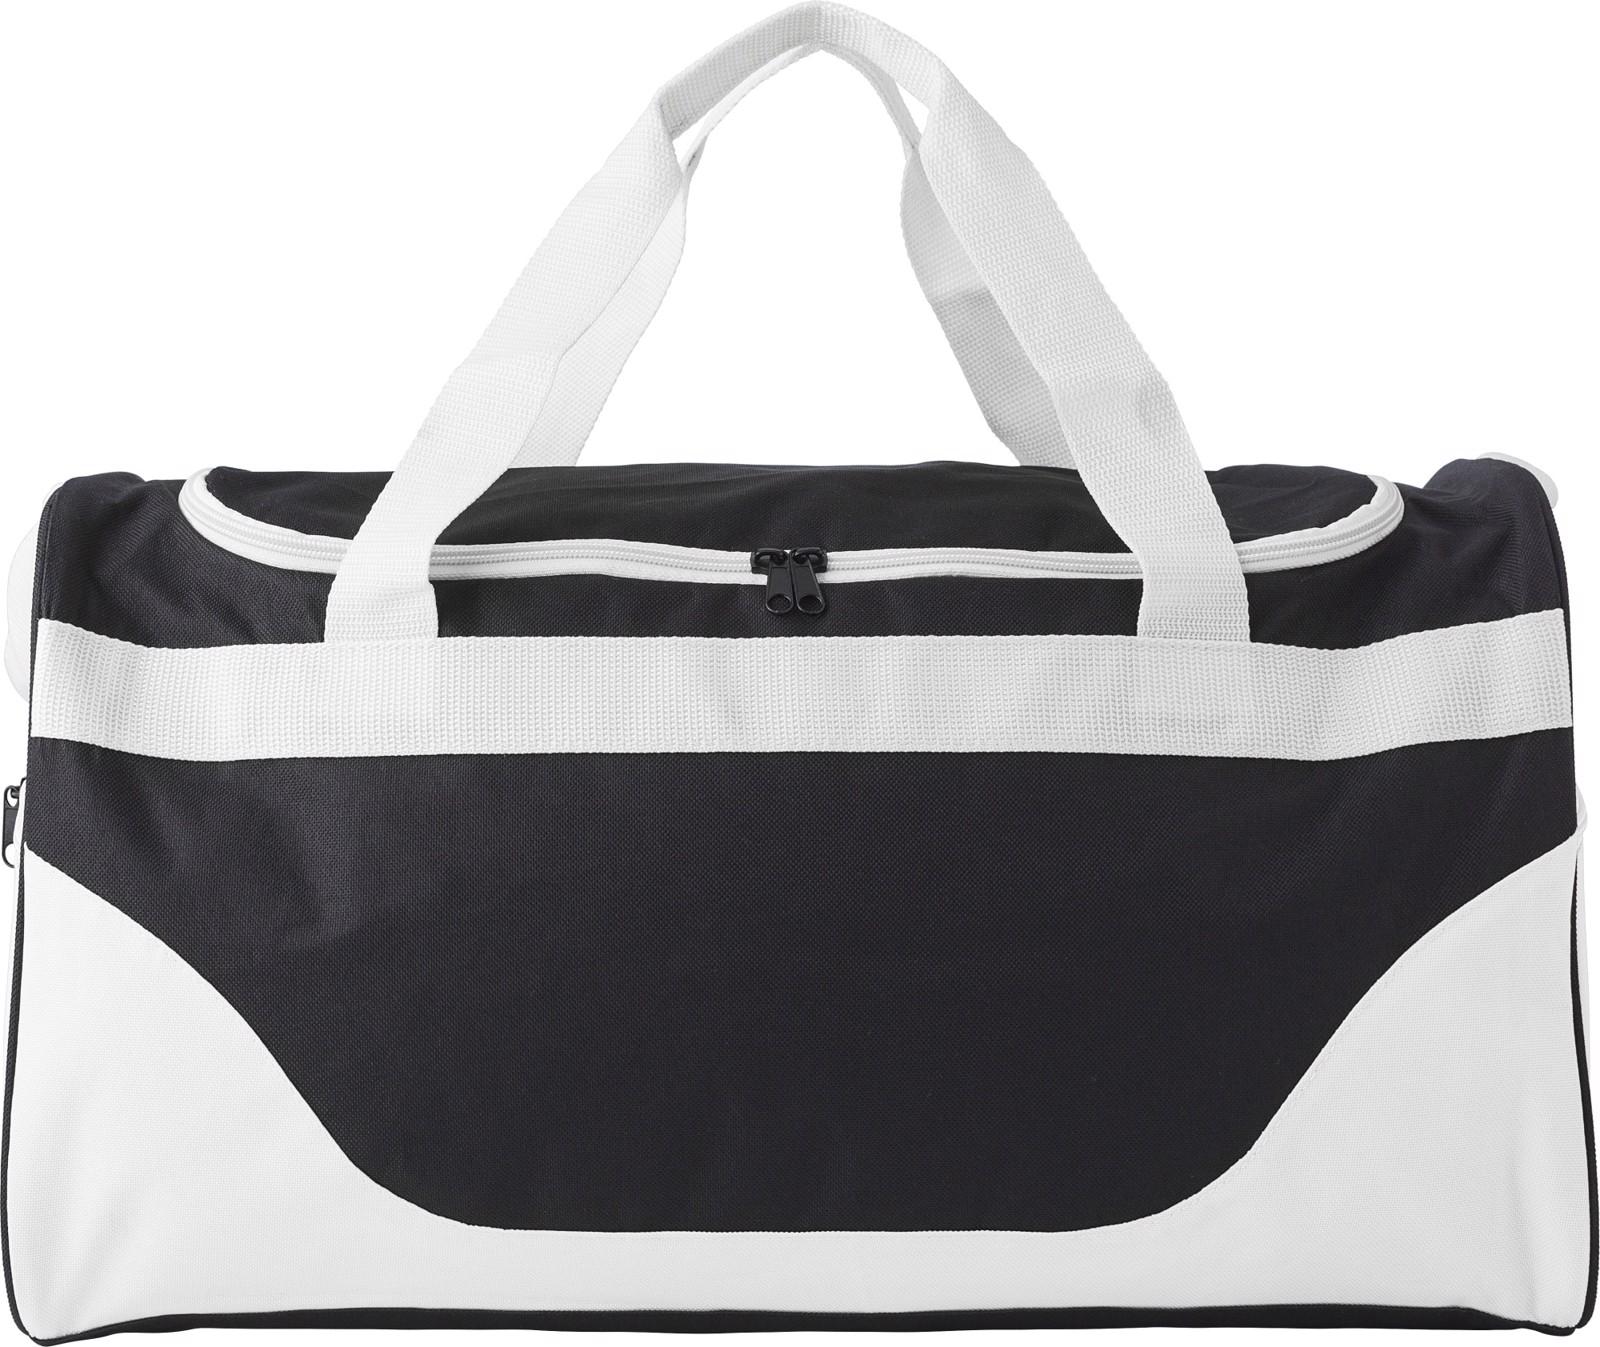 Polyester (600D) sports bag - White